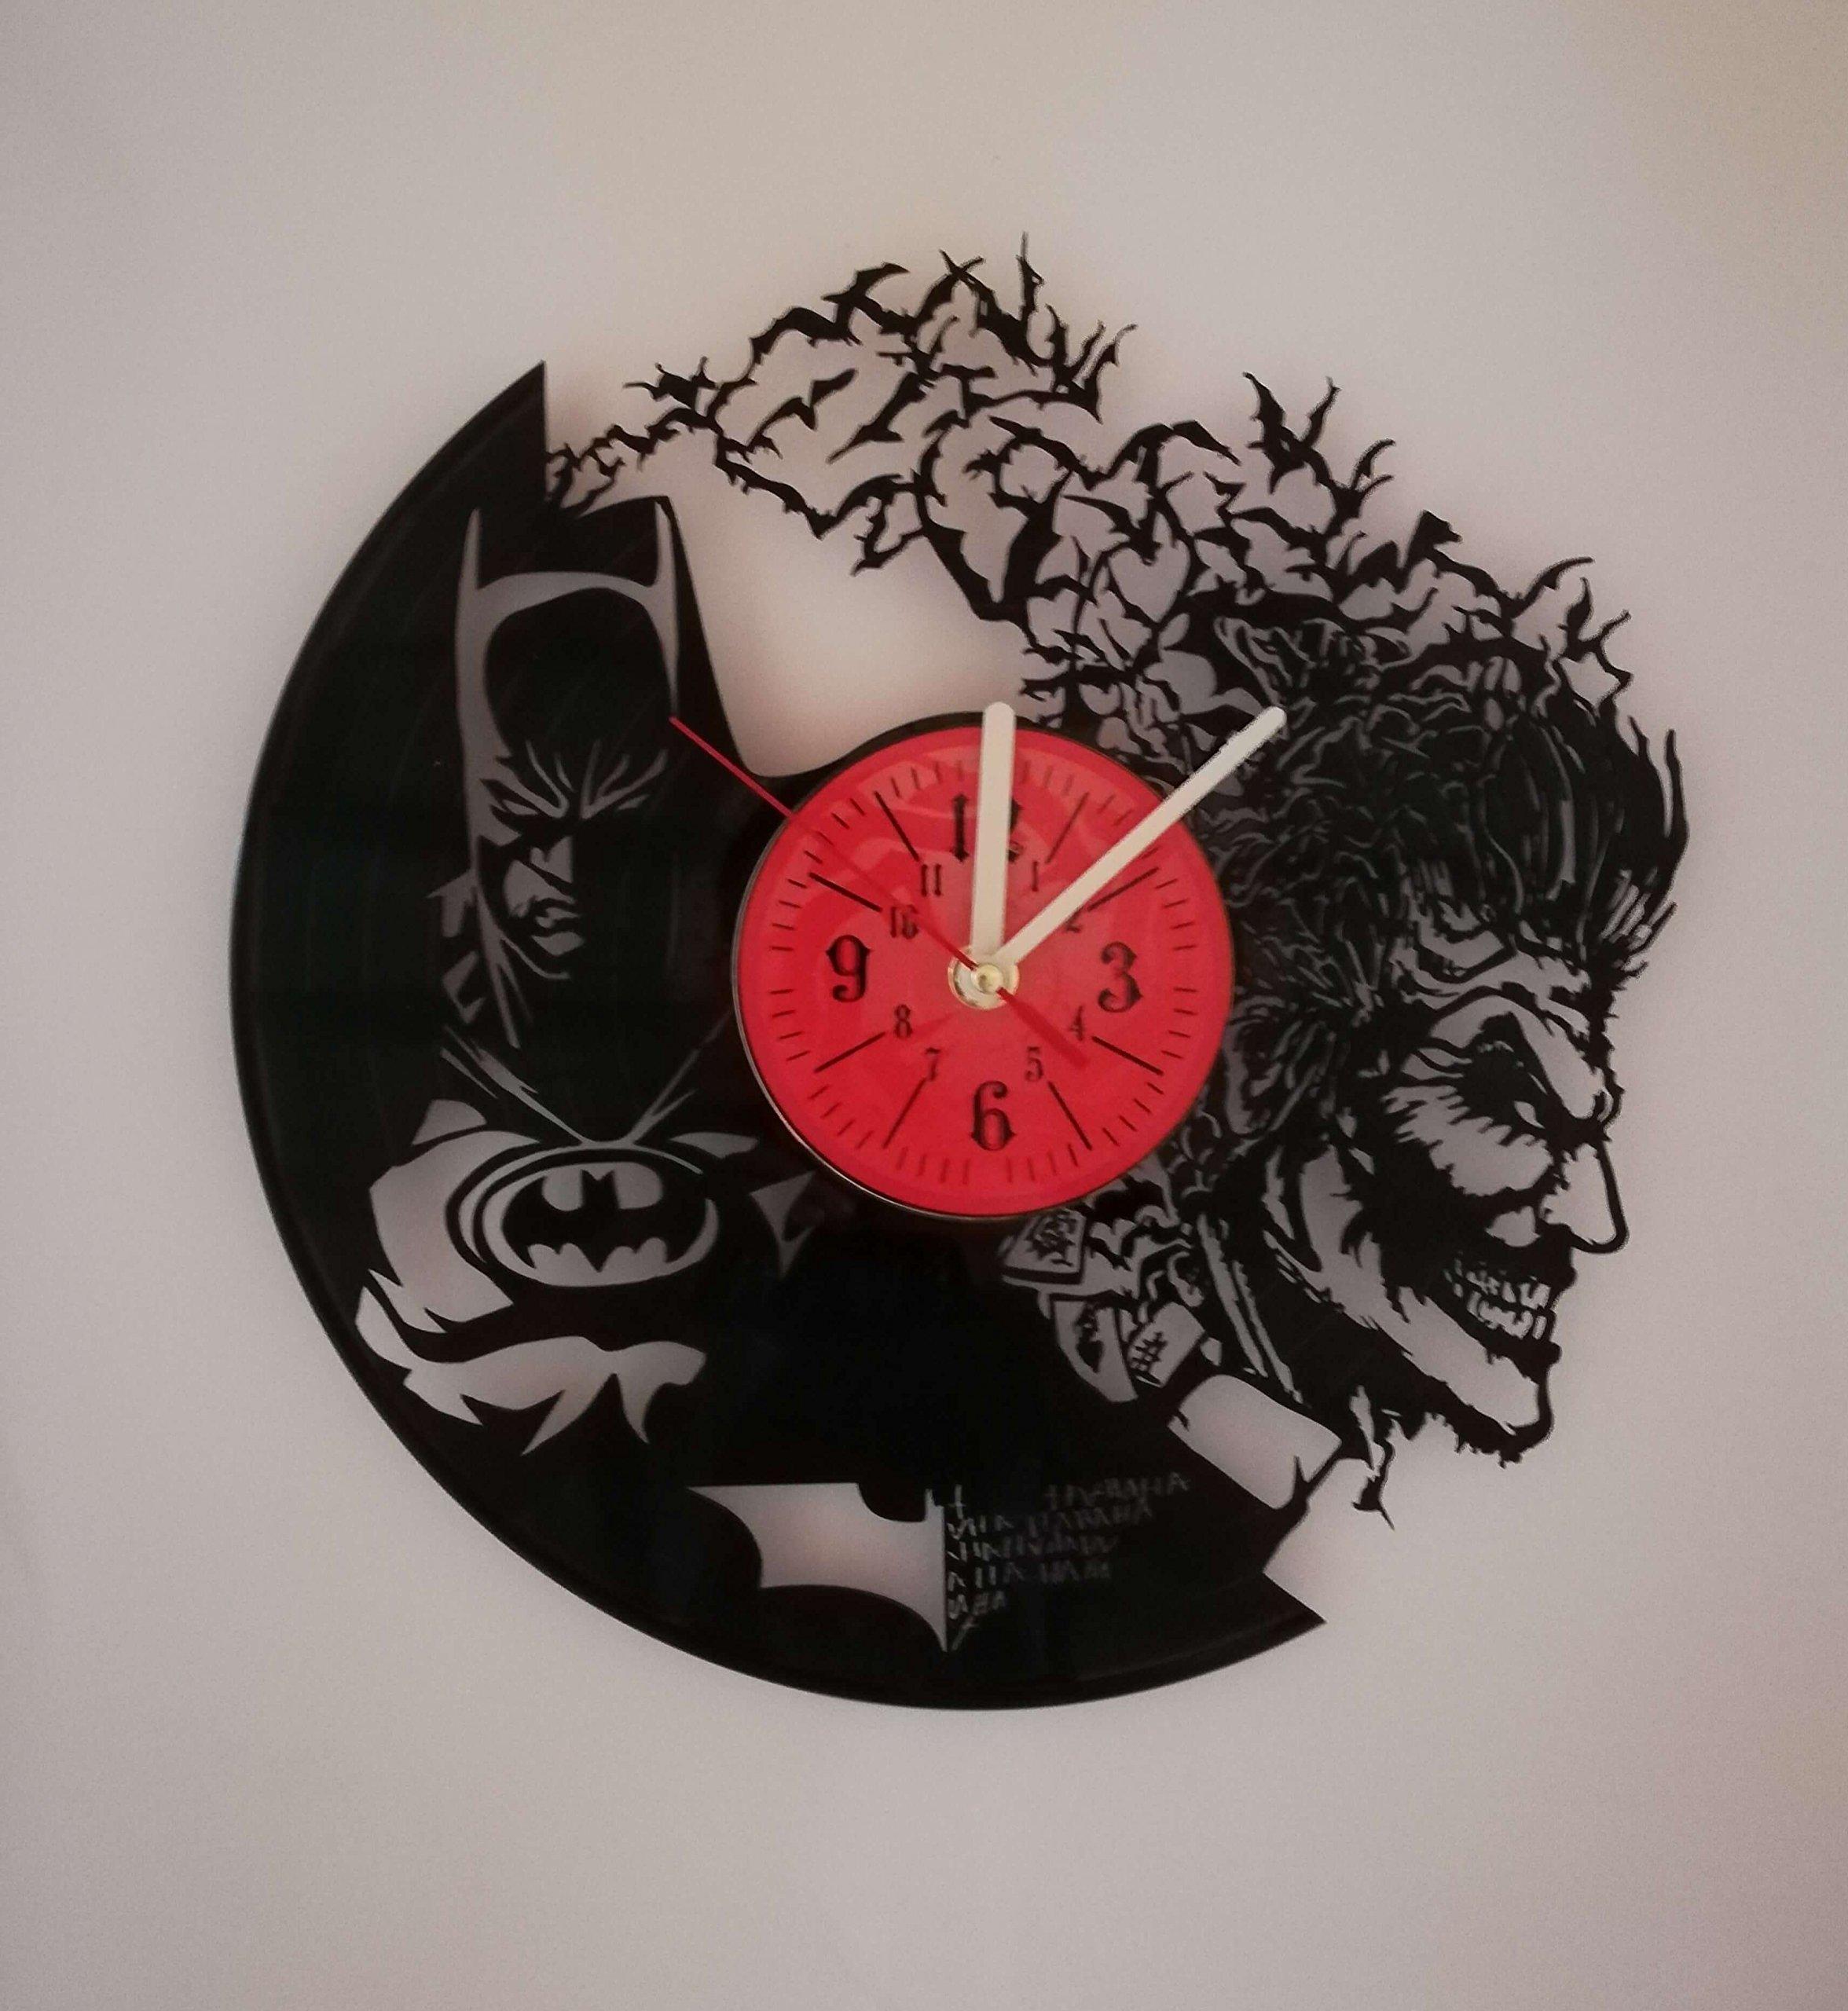 Dark Knight vs Joker 12 inches Vinyl Record Design Wall Clock - Batman Movie Characters - Get unique home room wall decor - Gift ideas for parents, teens – Epic Movie Unique Modern Art …